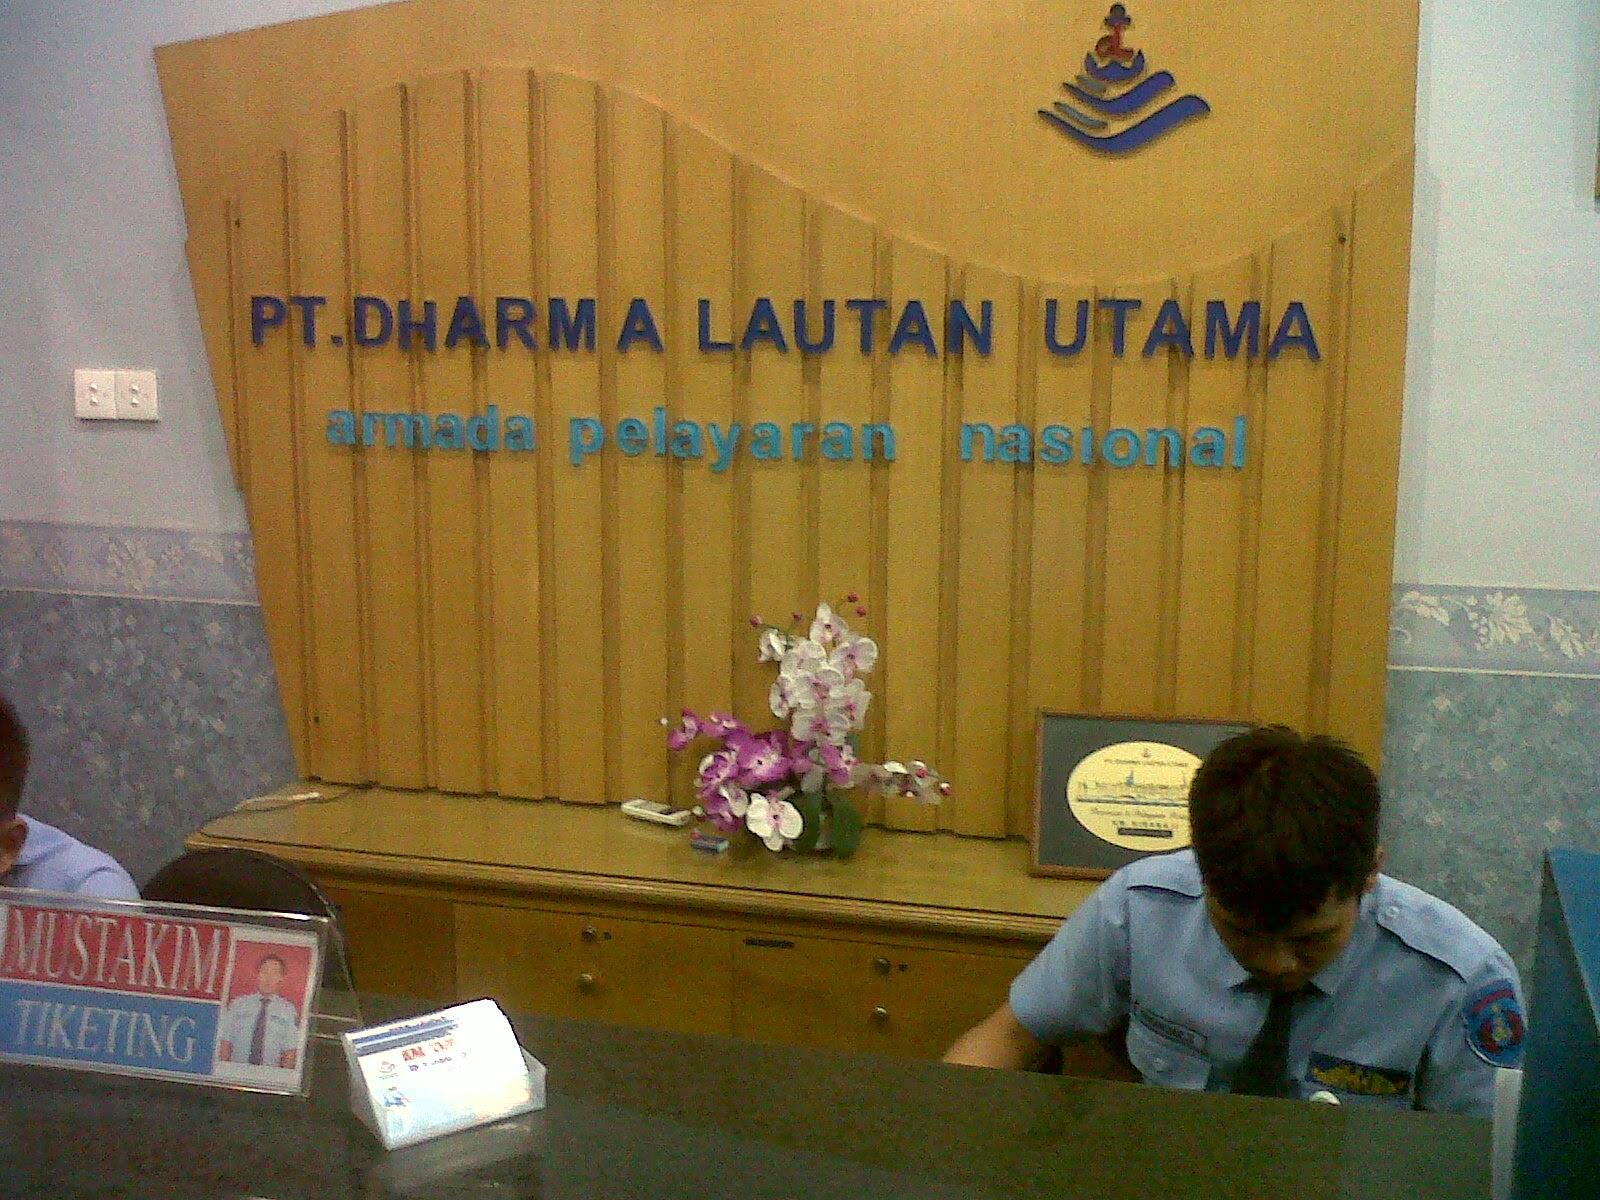 Bbm Turun Pelayanan Dharma Lautan Utama Banjarmasin Tetap